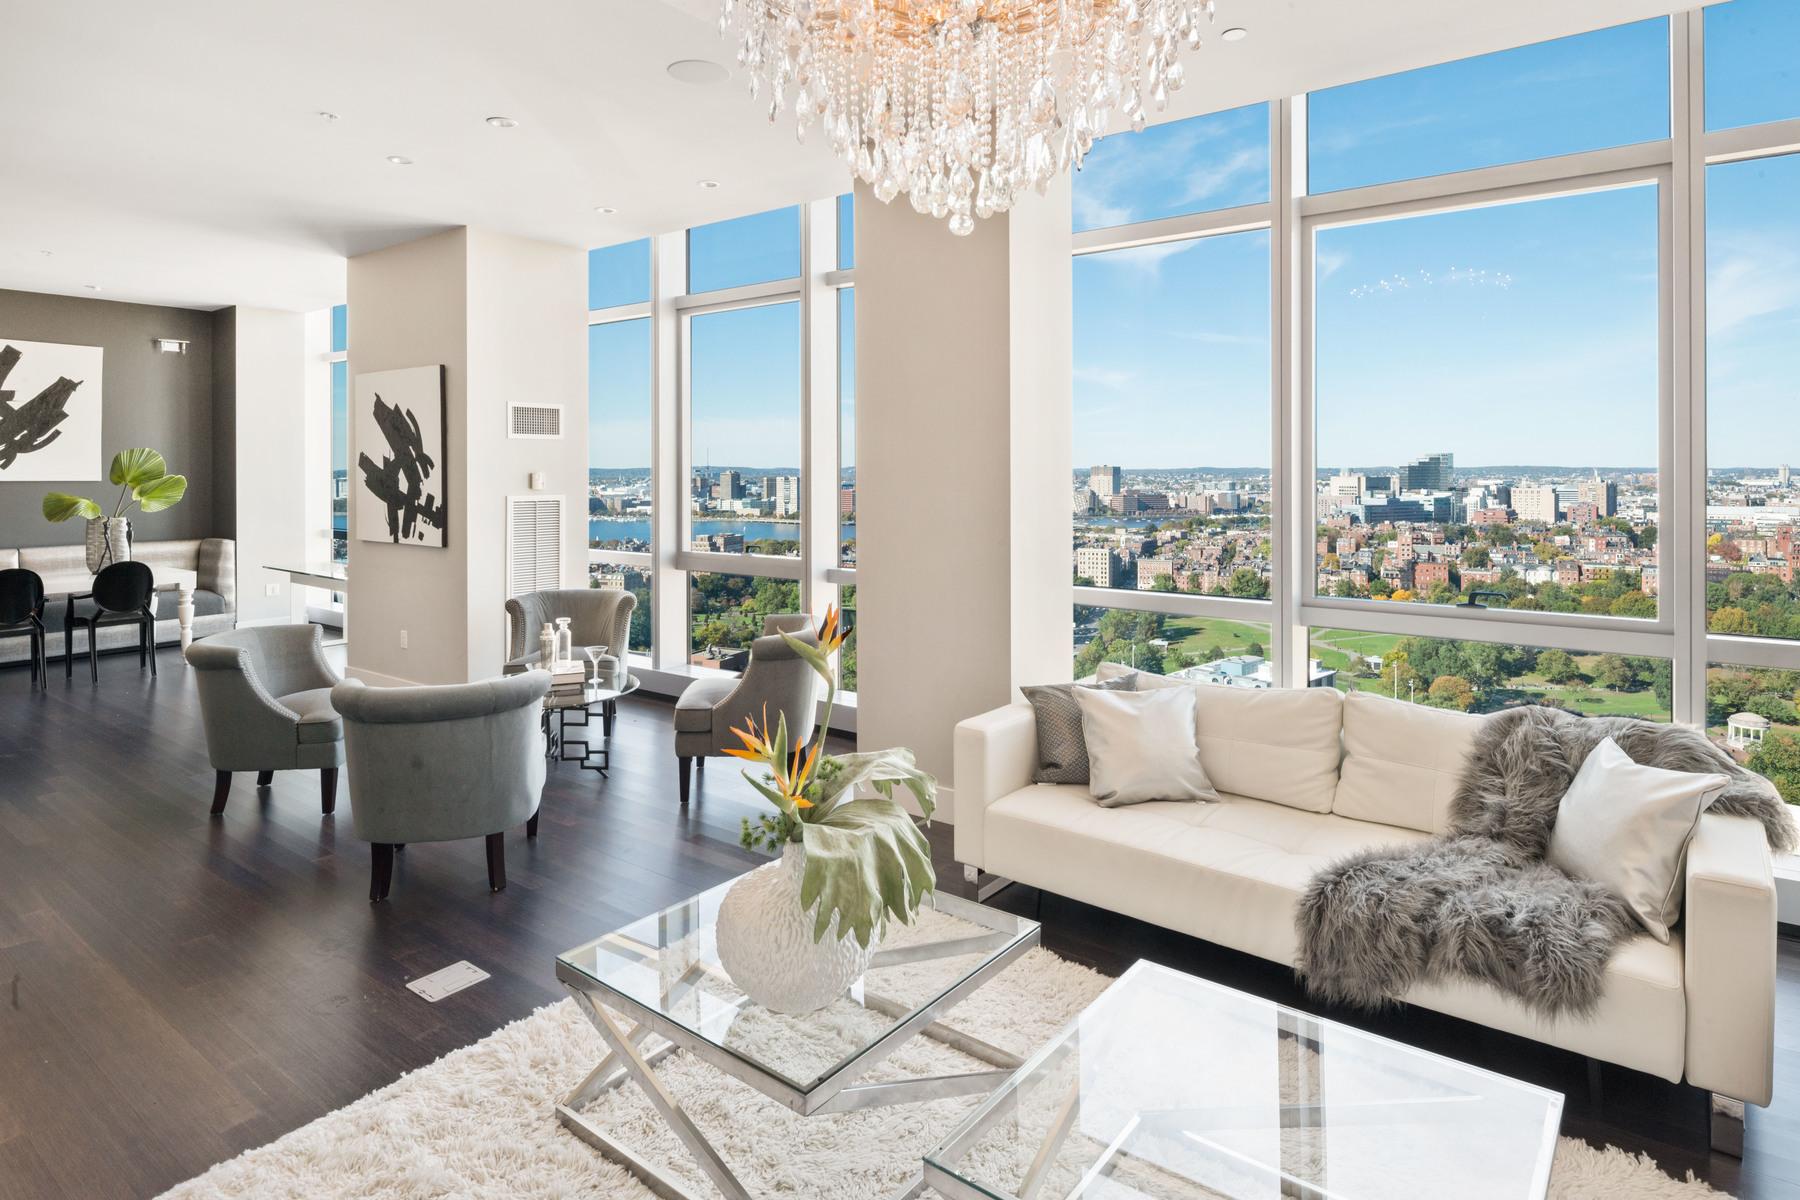 Condominiums 为 销售 在 Ultimate Boston Penthouse Condominium 110 Stuart Street Unit PH3, 波士顿, 马萨诸塞州 02116 美国